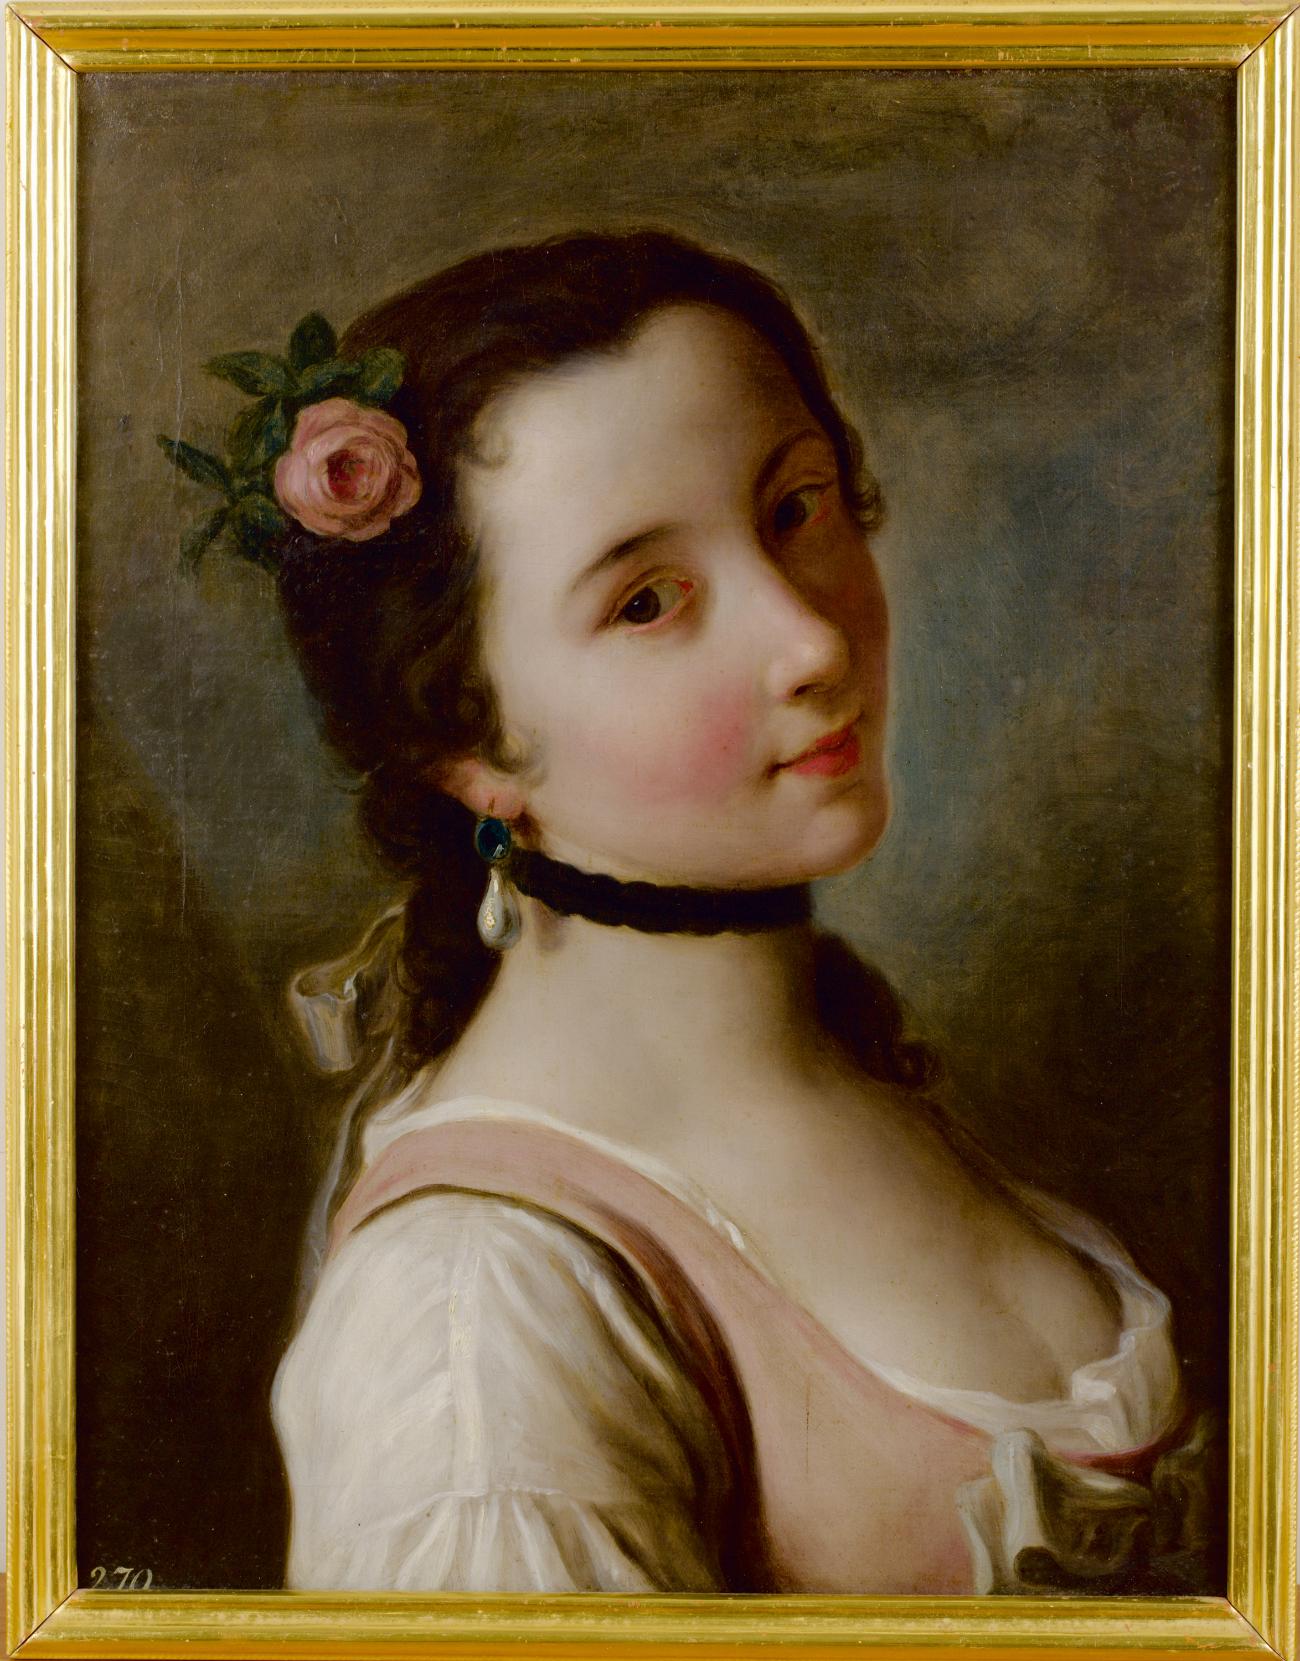 Fanciulla con una rosa tra i capelli. 1756-1762\n